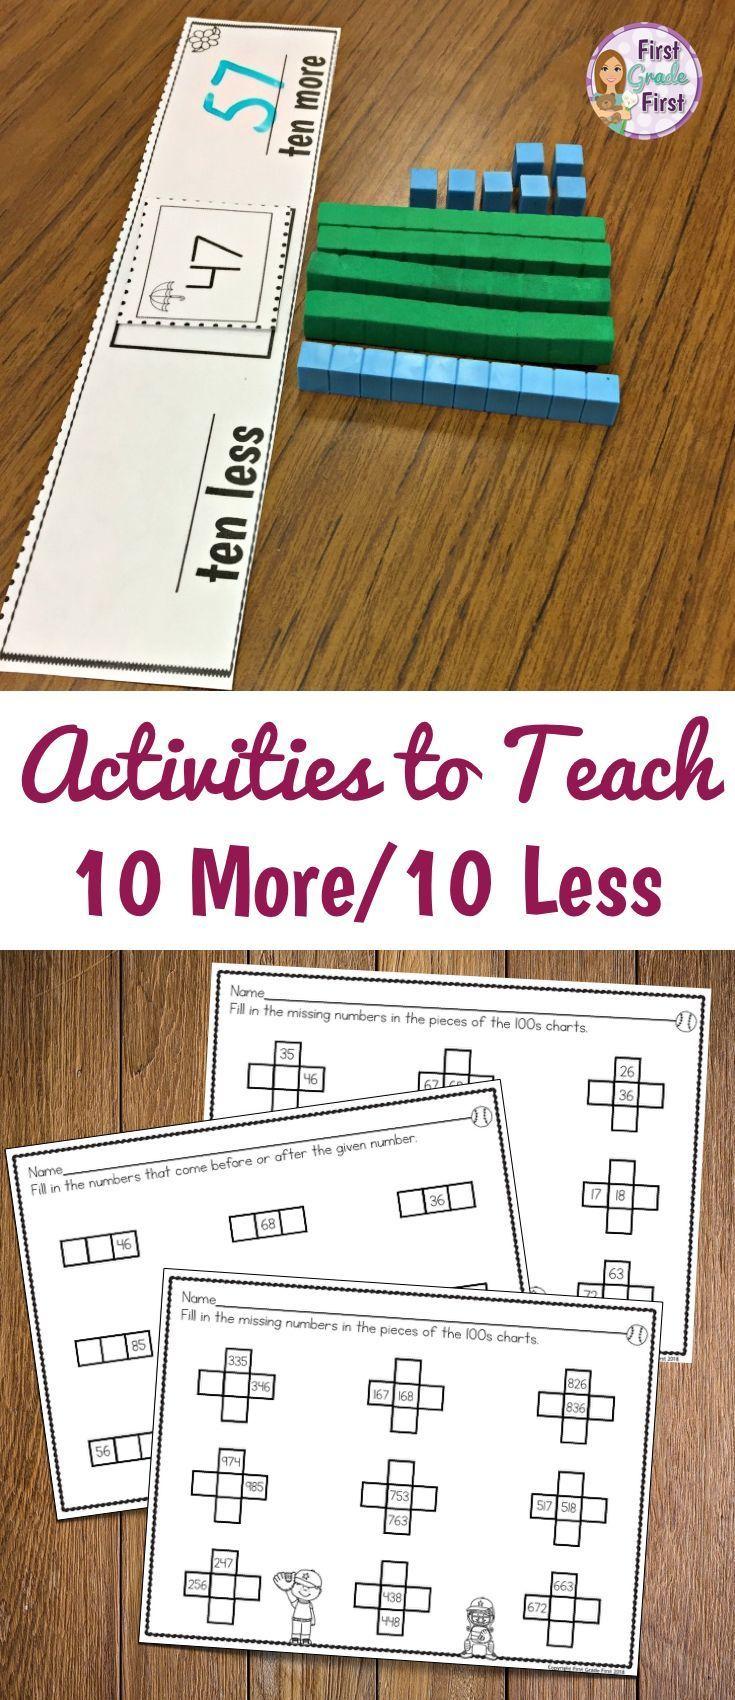 10 More 10 Less And Other Winter First Grade No Prep Printables Winter Math 1st Grade Math Math School [ 1056 x 816 Pixel ]